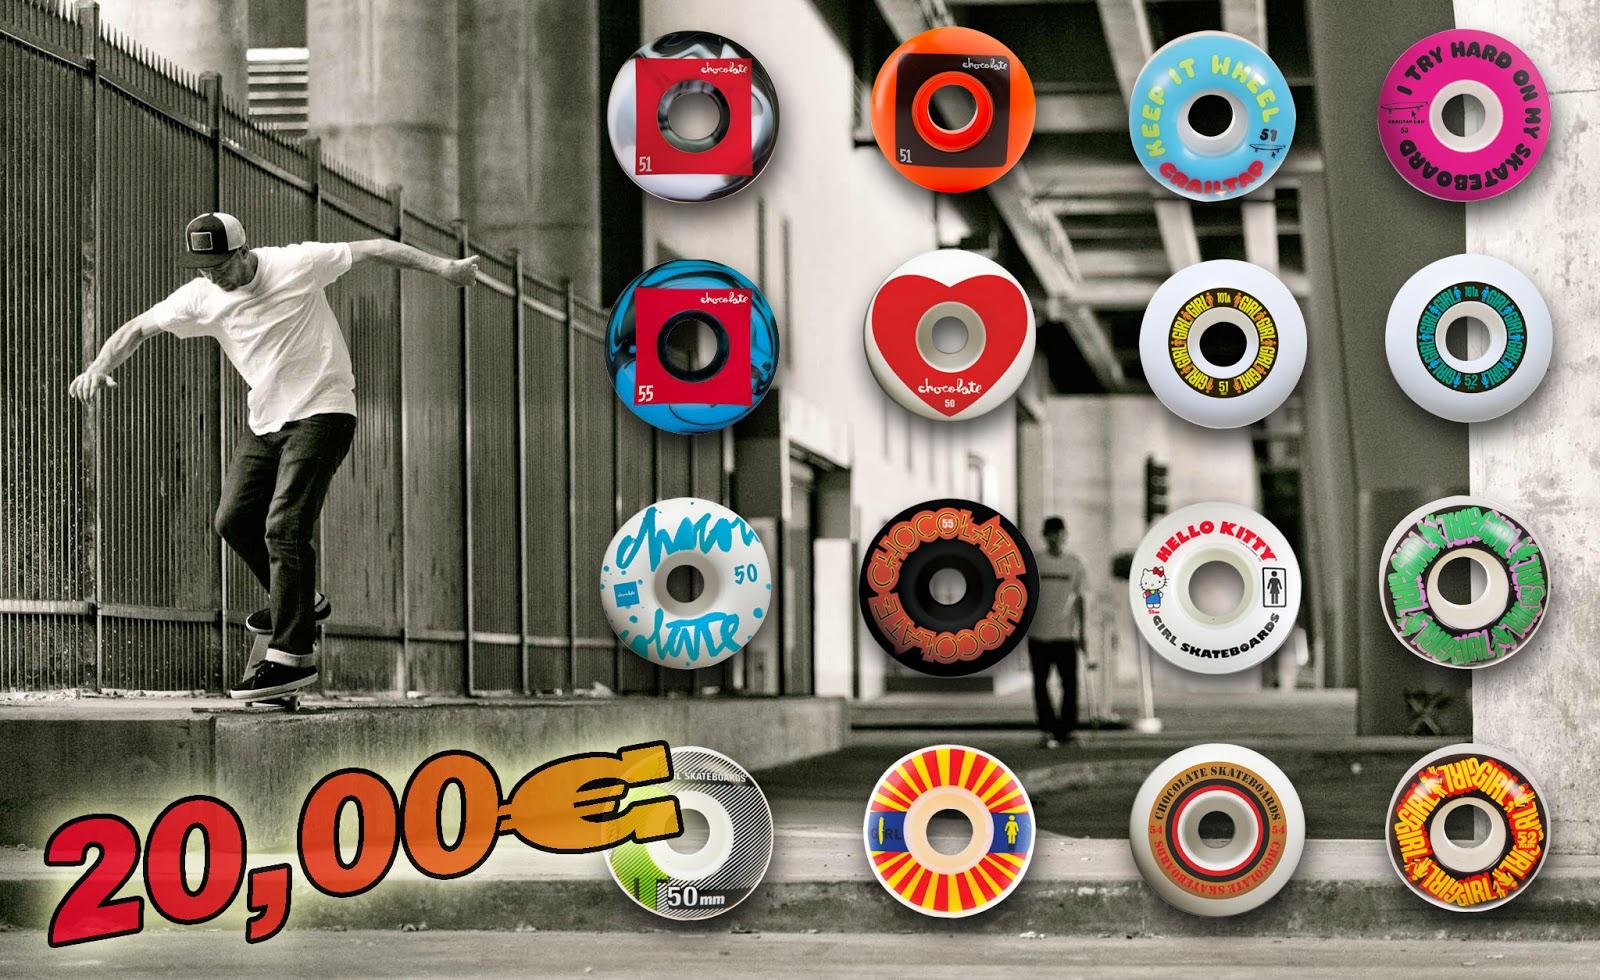 http://www.skateboard-stance.com/ofertas-1.html